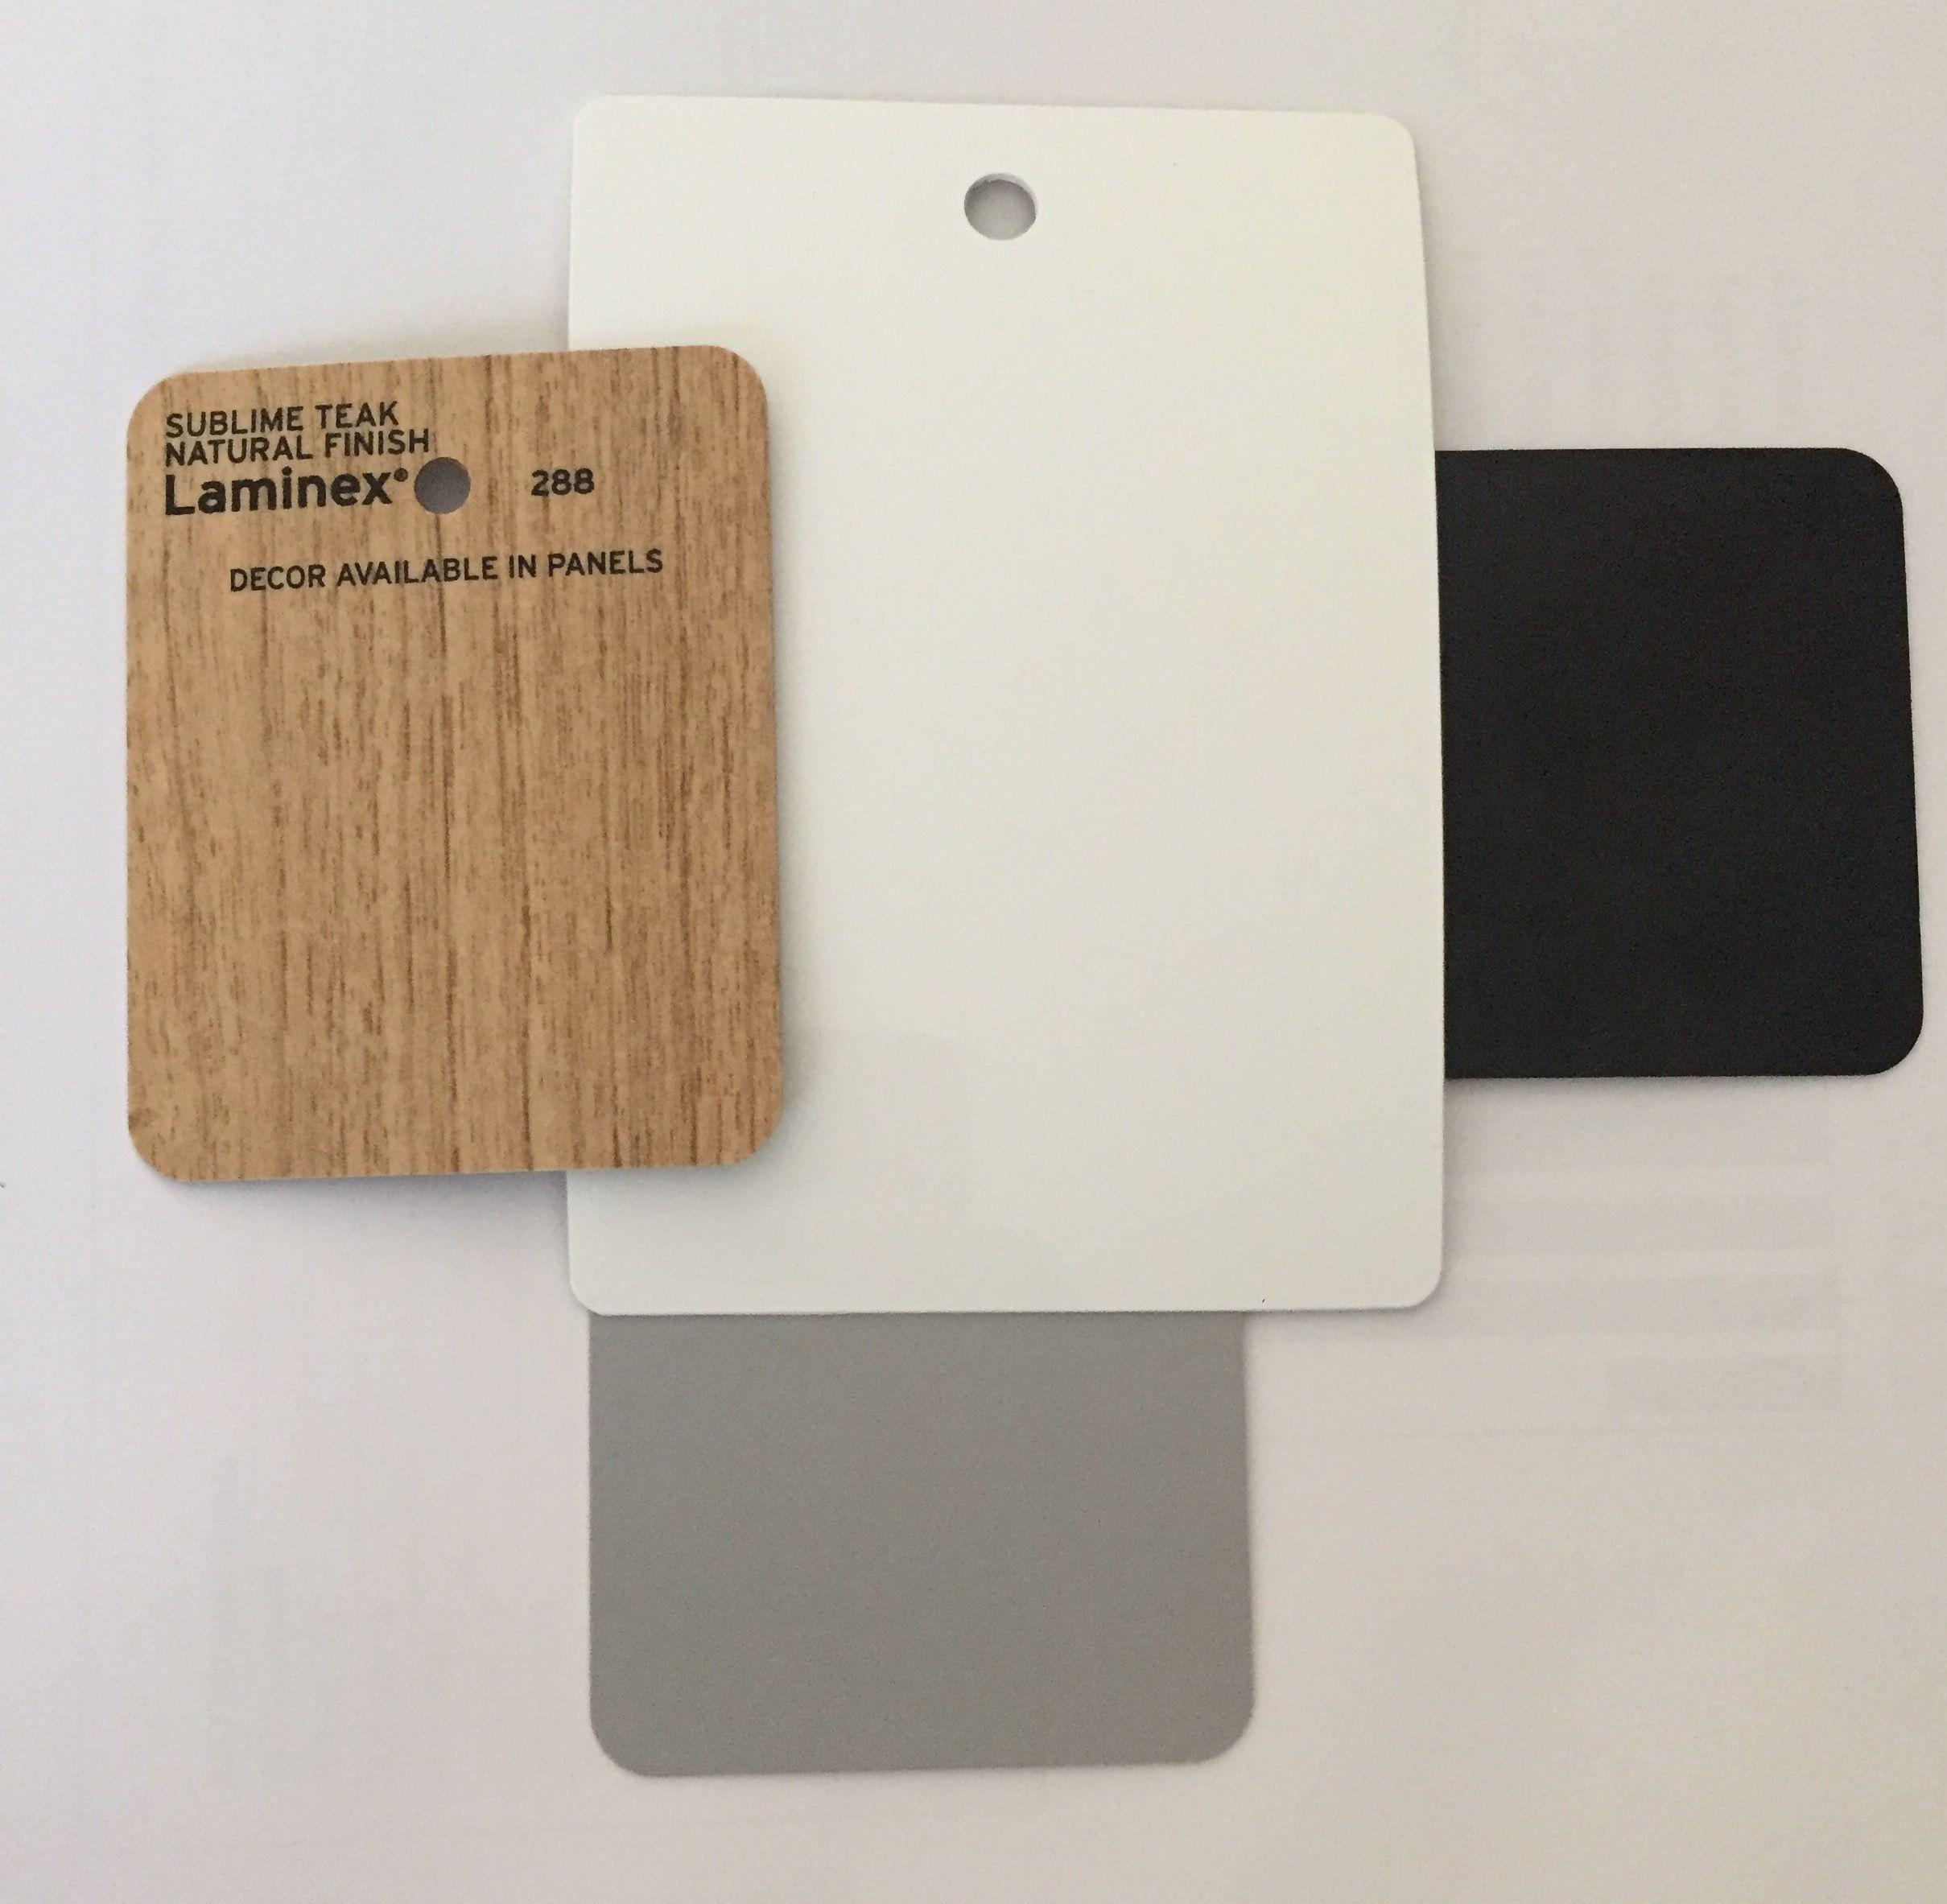 Bathroom colour board - laminex sublime teak riven finish (vanity ...